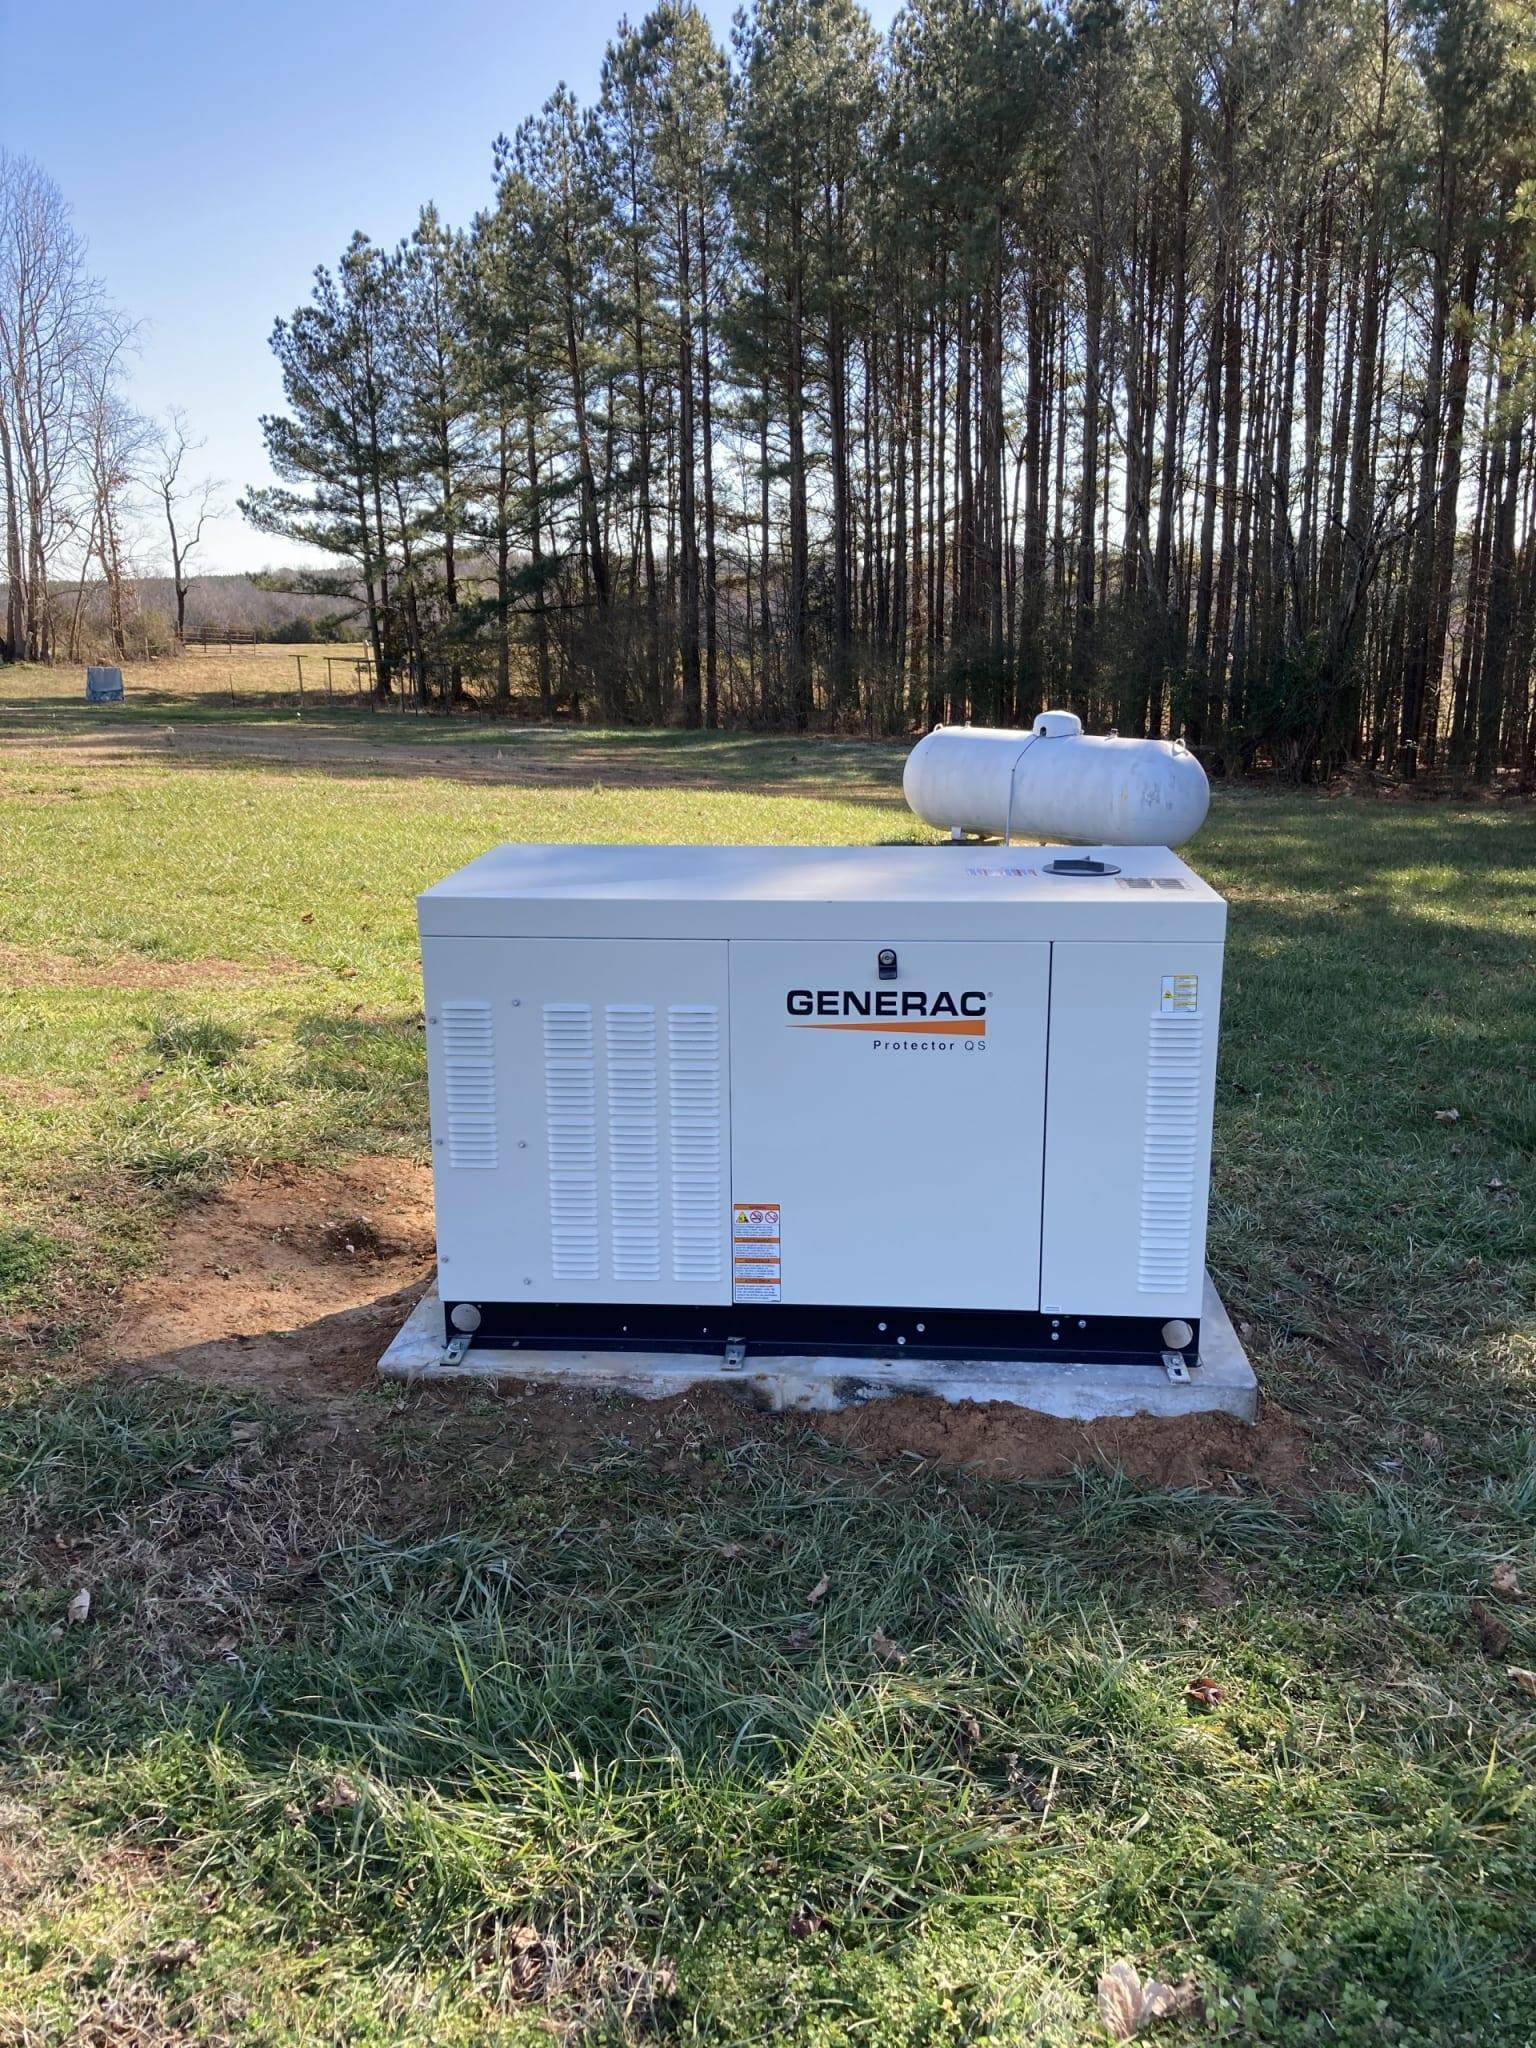 4.20.21 Nottoway Generac Automatic Standby Generator